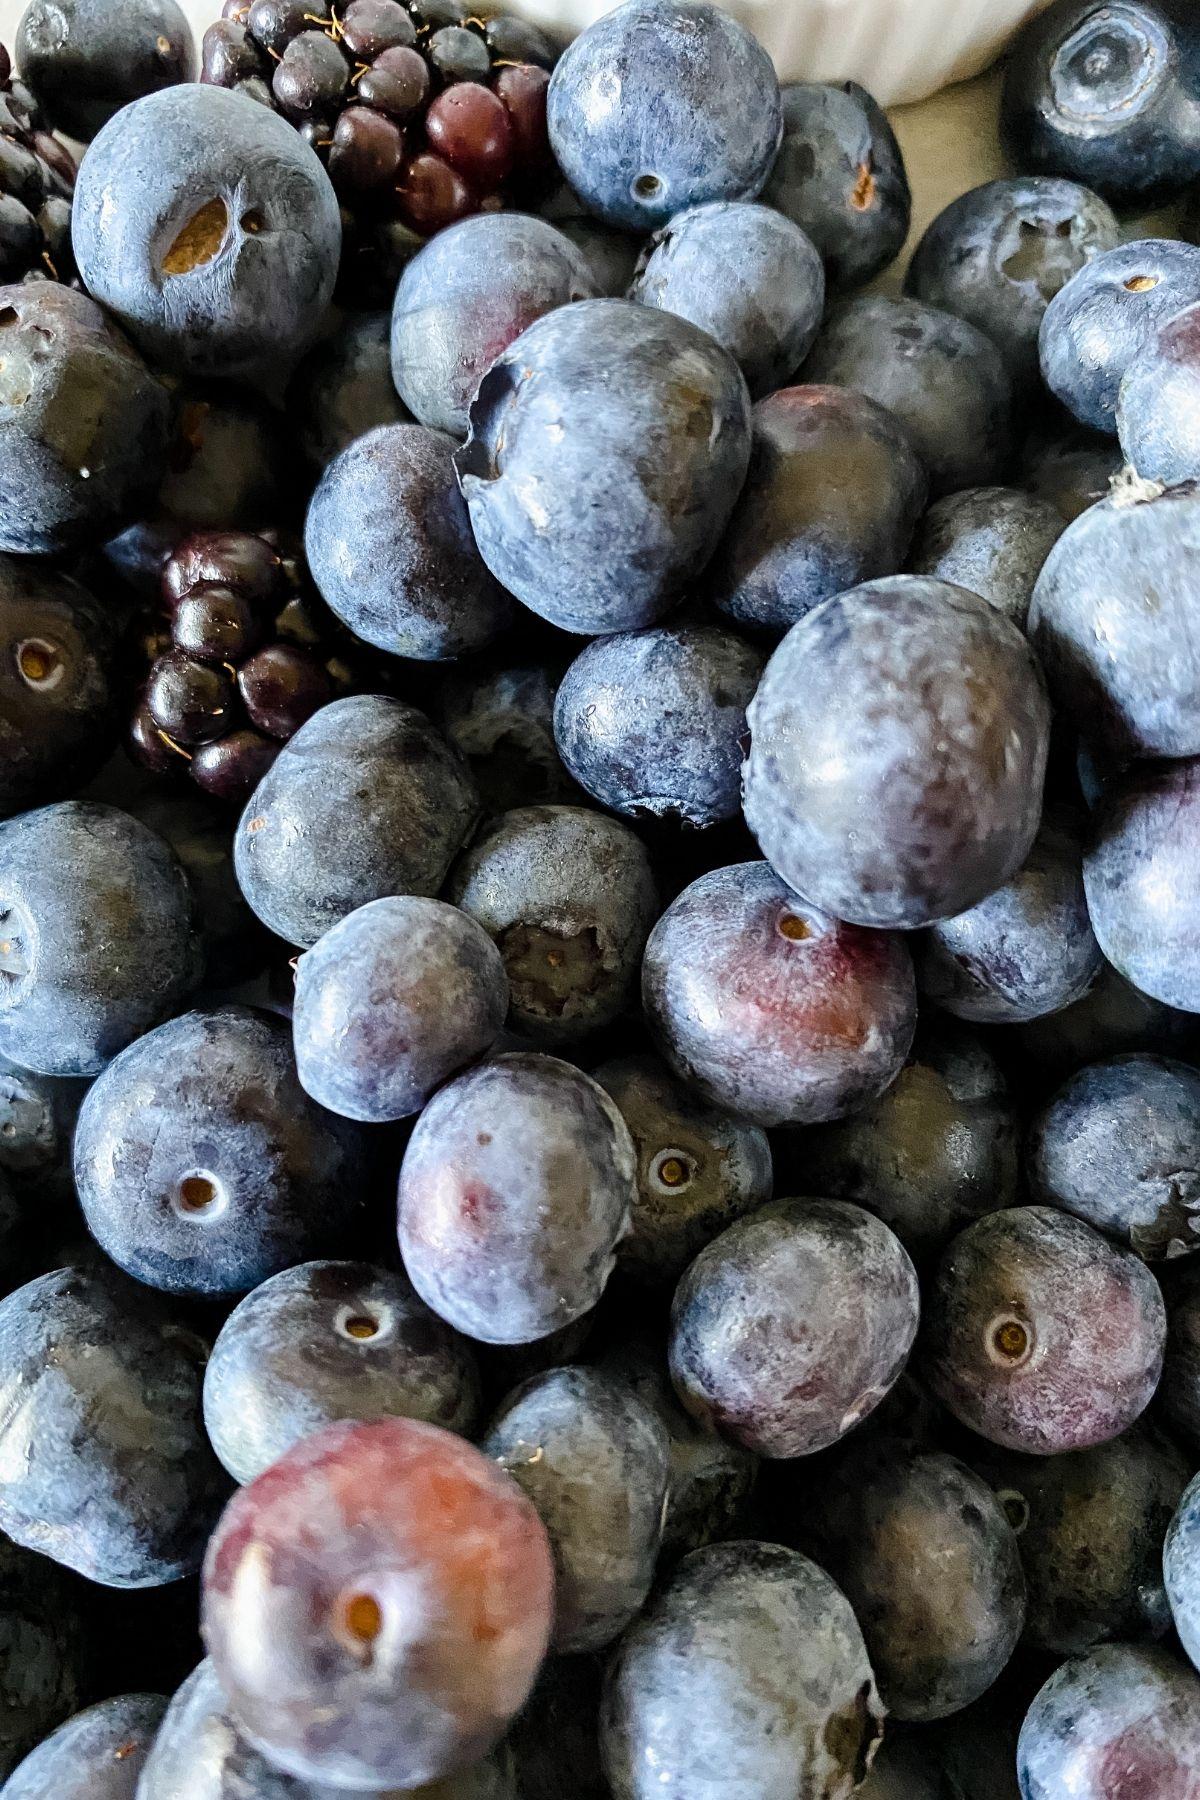 Blueberries next to blackberries